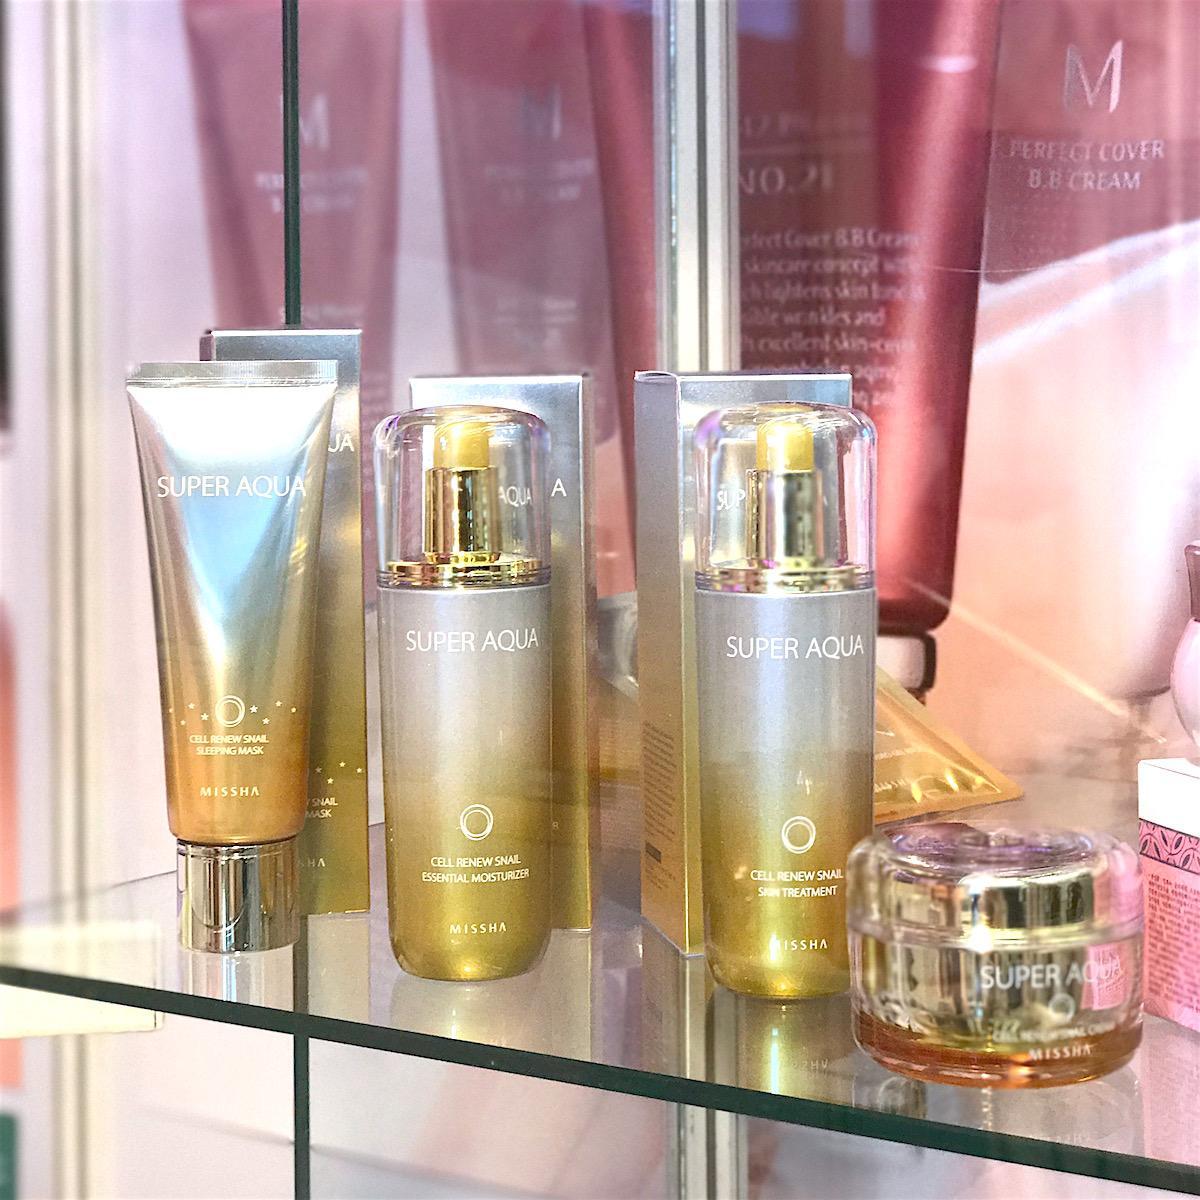 sejem kozmetike love beauty knez naravna kozmetika by Beautyfullblog